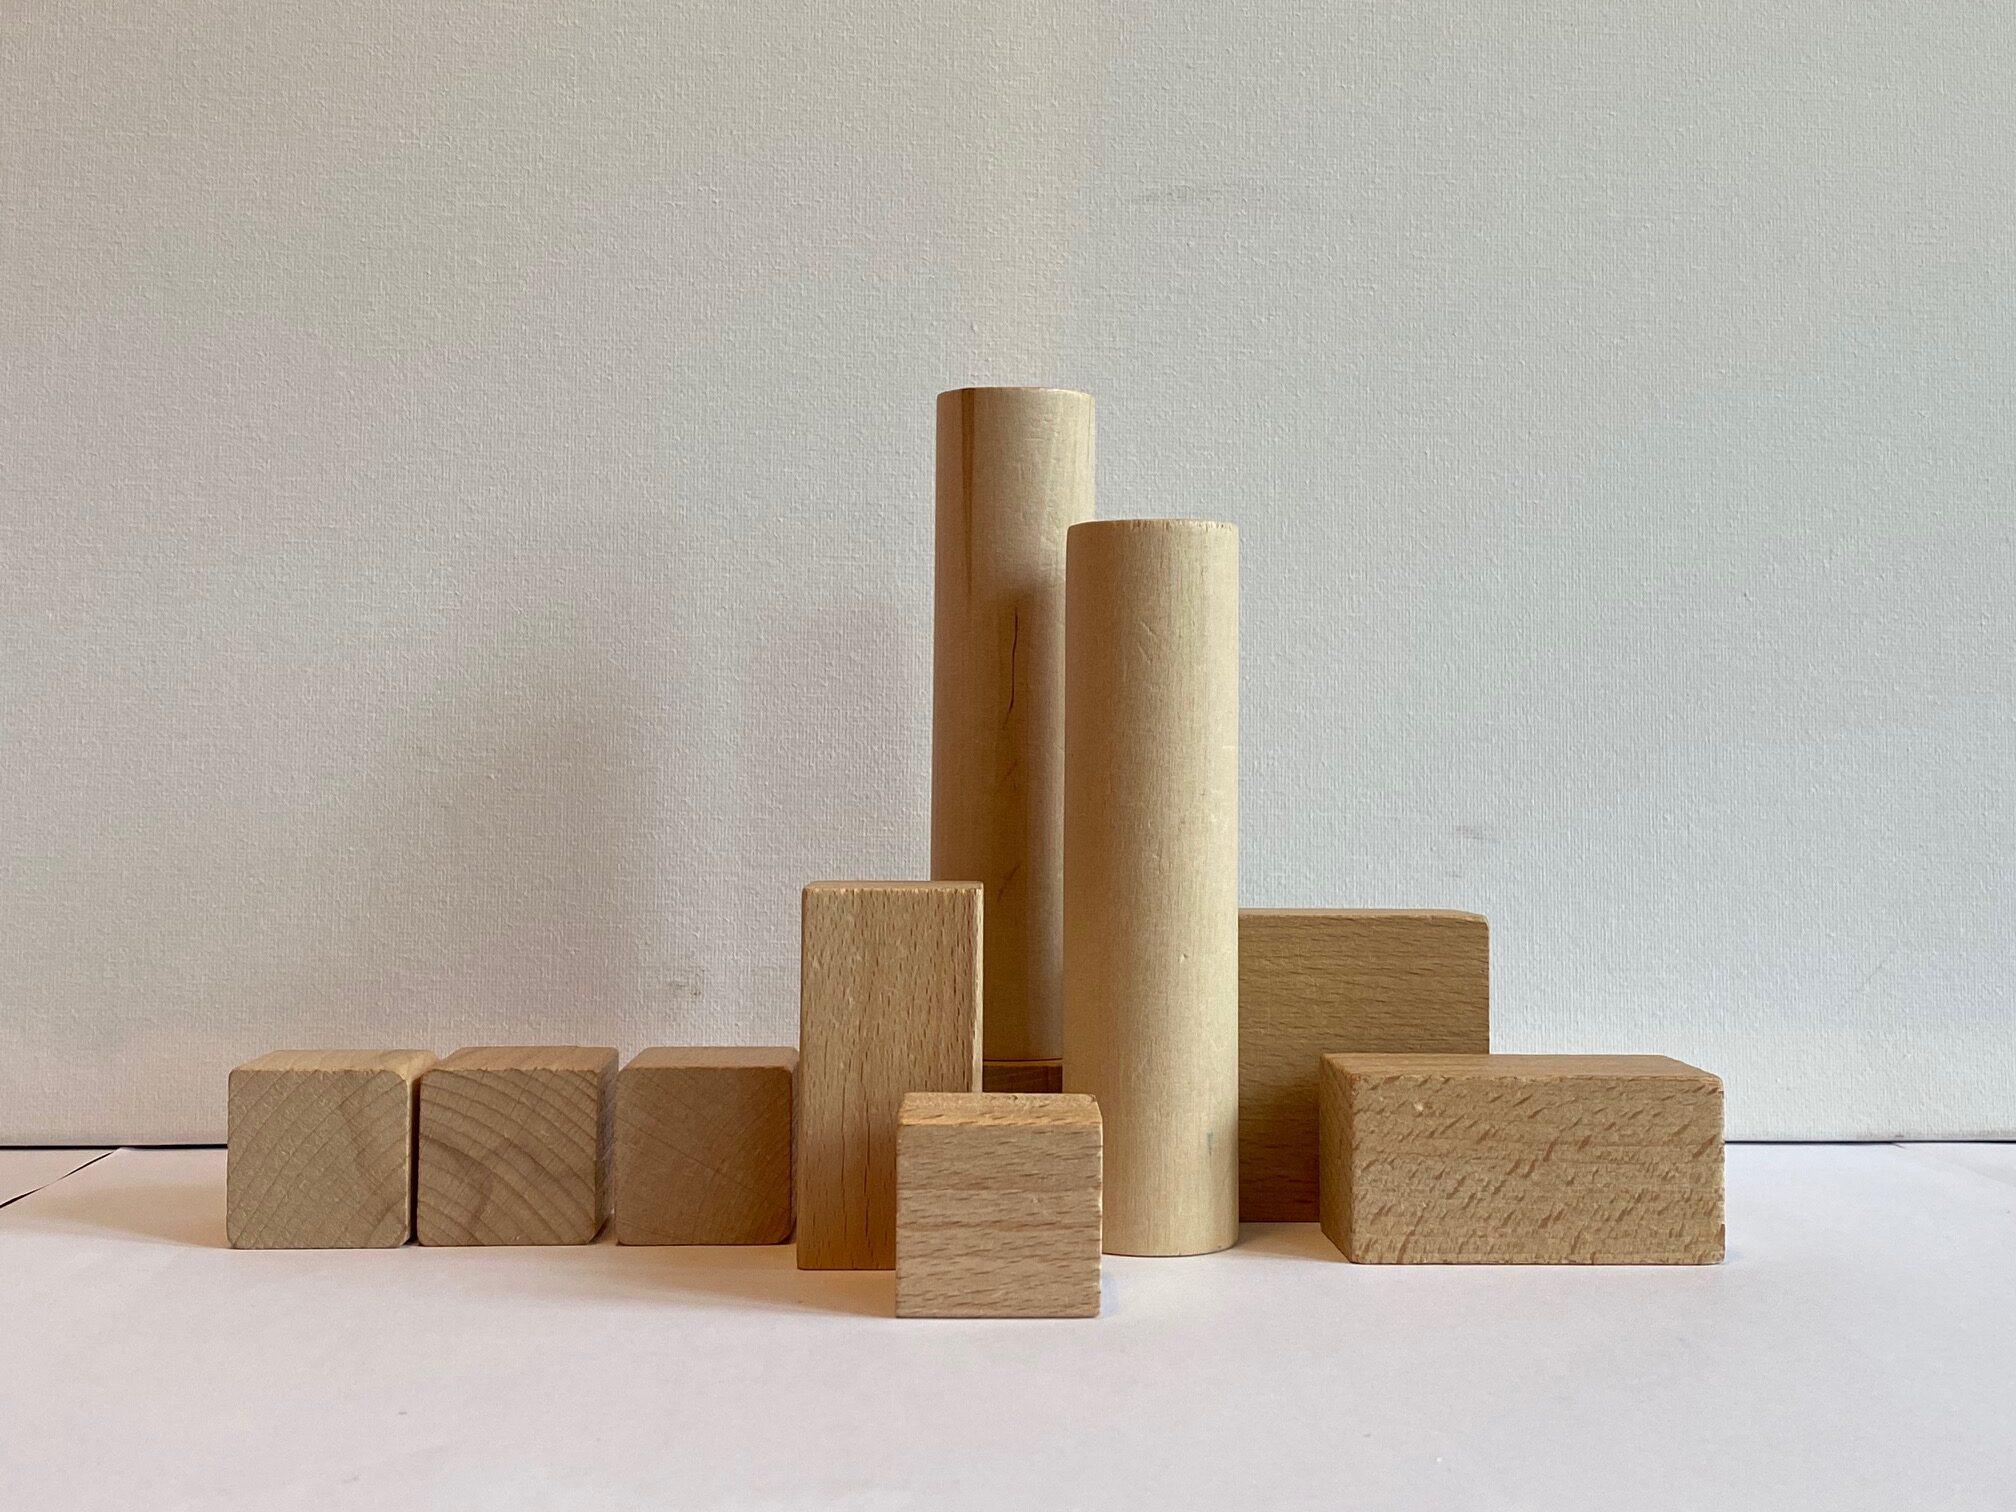 compositie asymmetrie